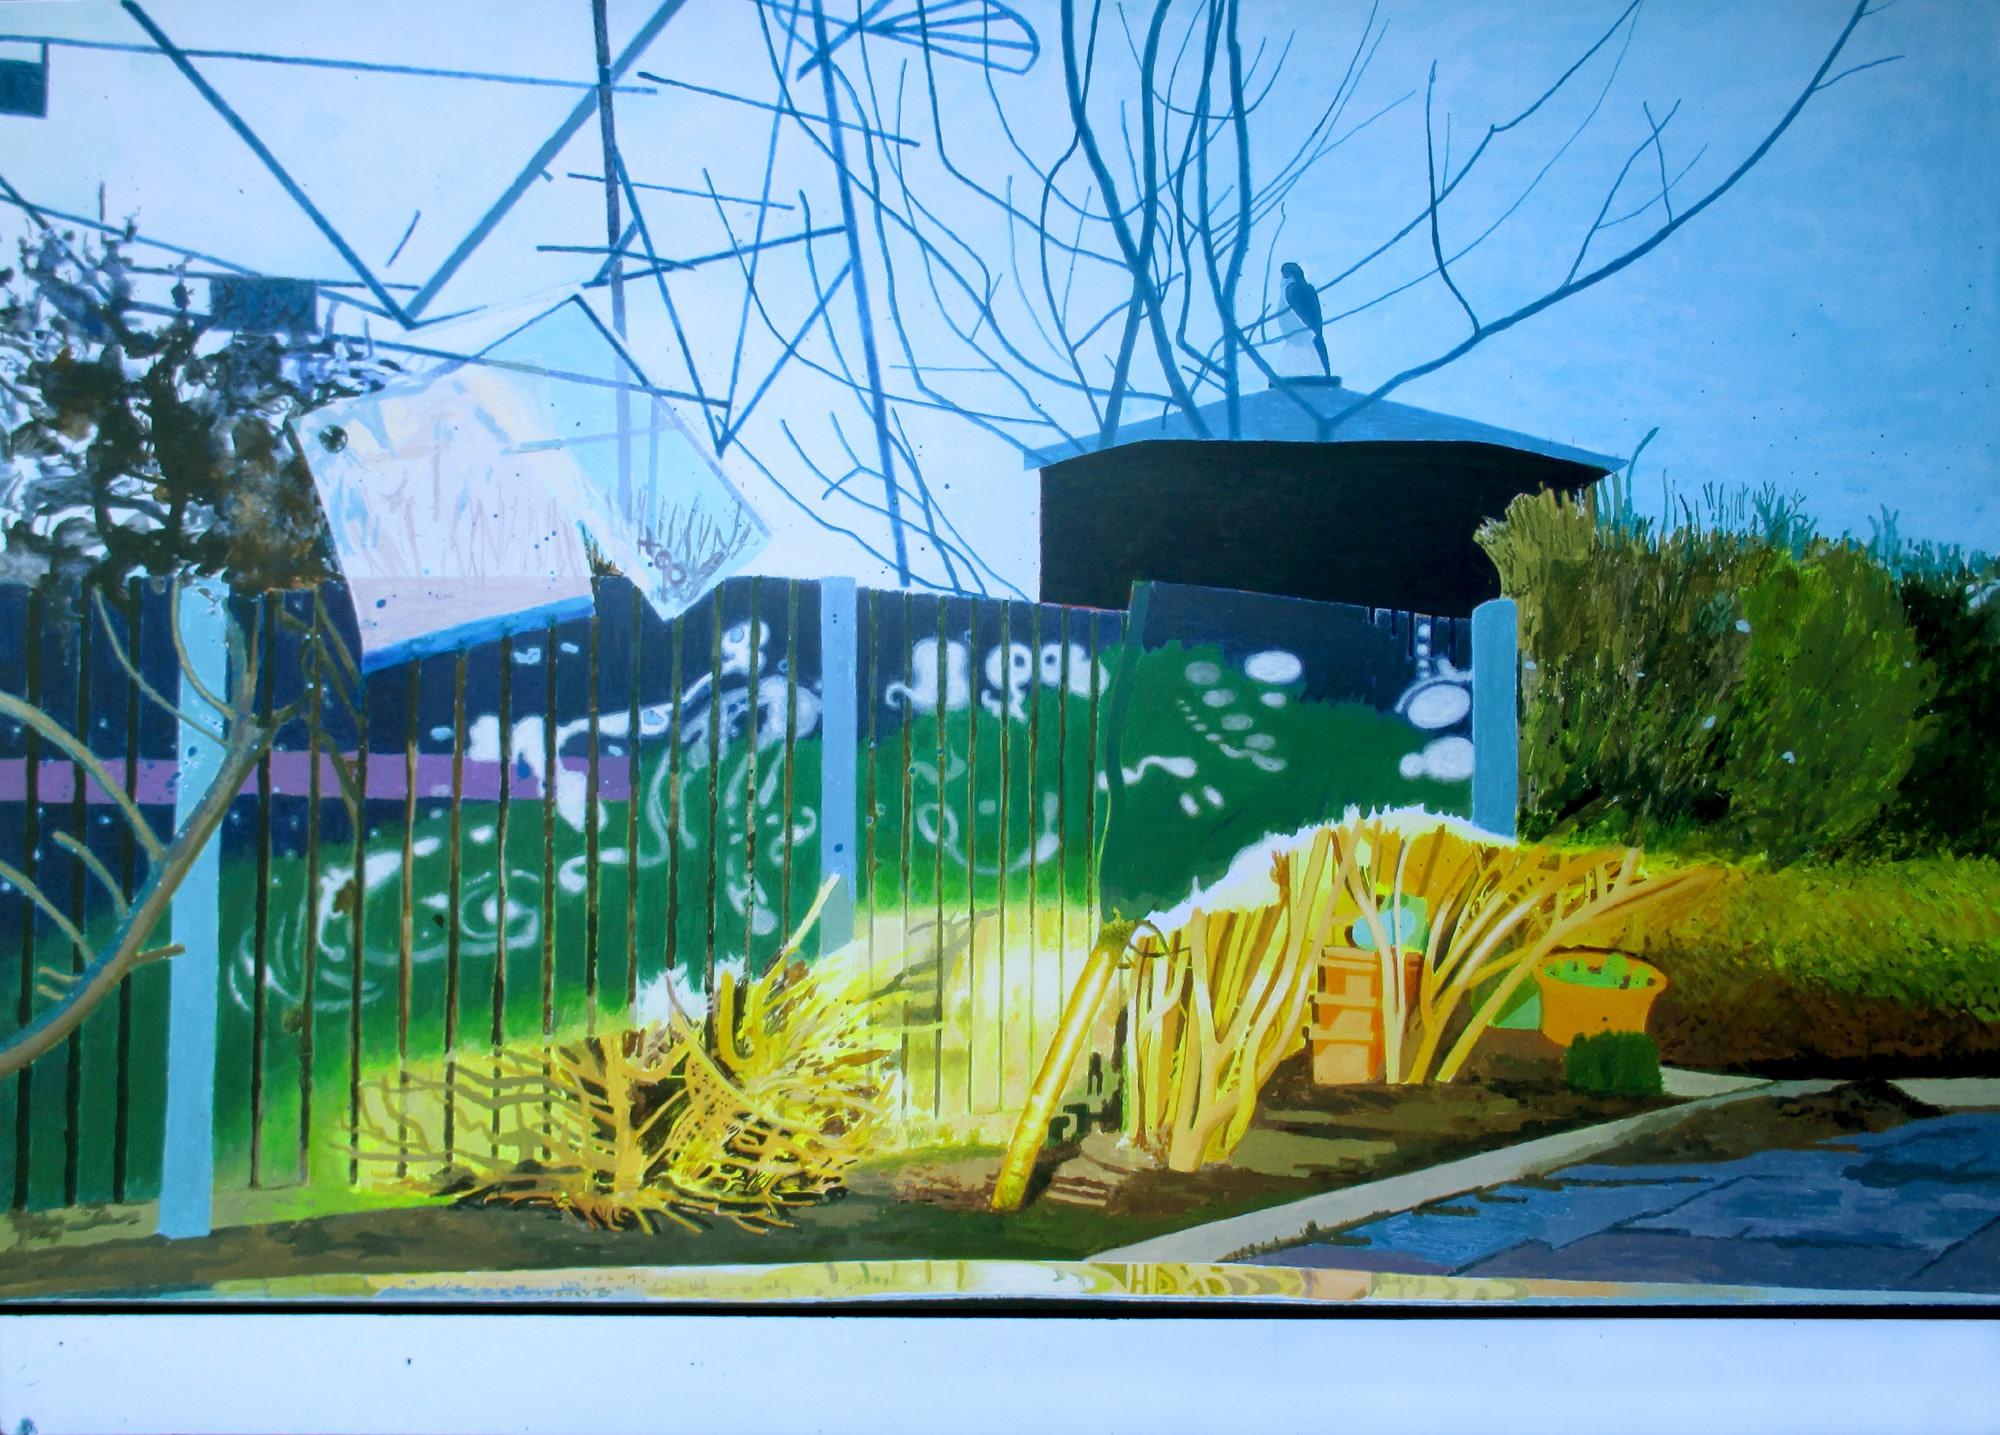 <span class=&#34;link fancybox-details-link&#34;><a href=&#34;/artists/88-iain-nicholls/works/9514-iain-nicholls-twilight-pulling-in/&#34;>View Detail Page</a></span><div class=&#34;artist&#34;><span class=&#34;artist&#34;><strong>Iain Nicholls</strong></span></div><div class=&#34;title&#34;><em>Twilight Pulling In</em></div><div class=&#34;medium&#34;>watercolour</div>